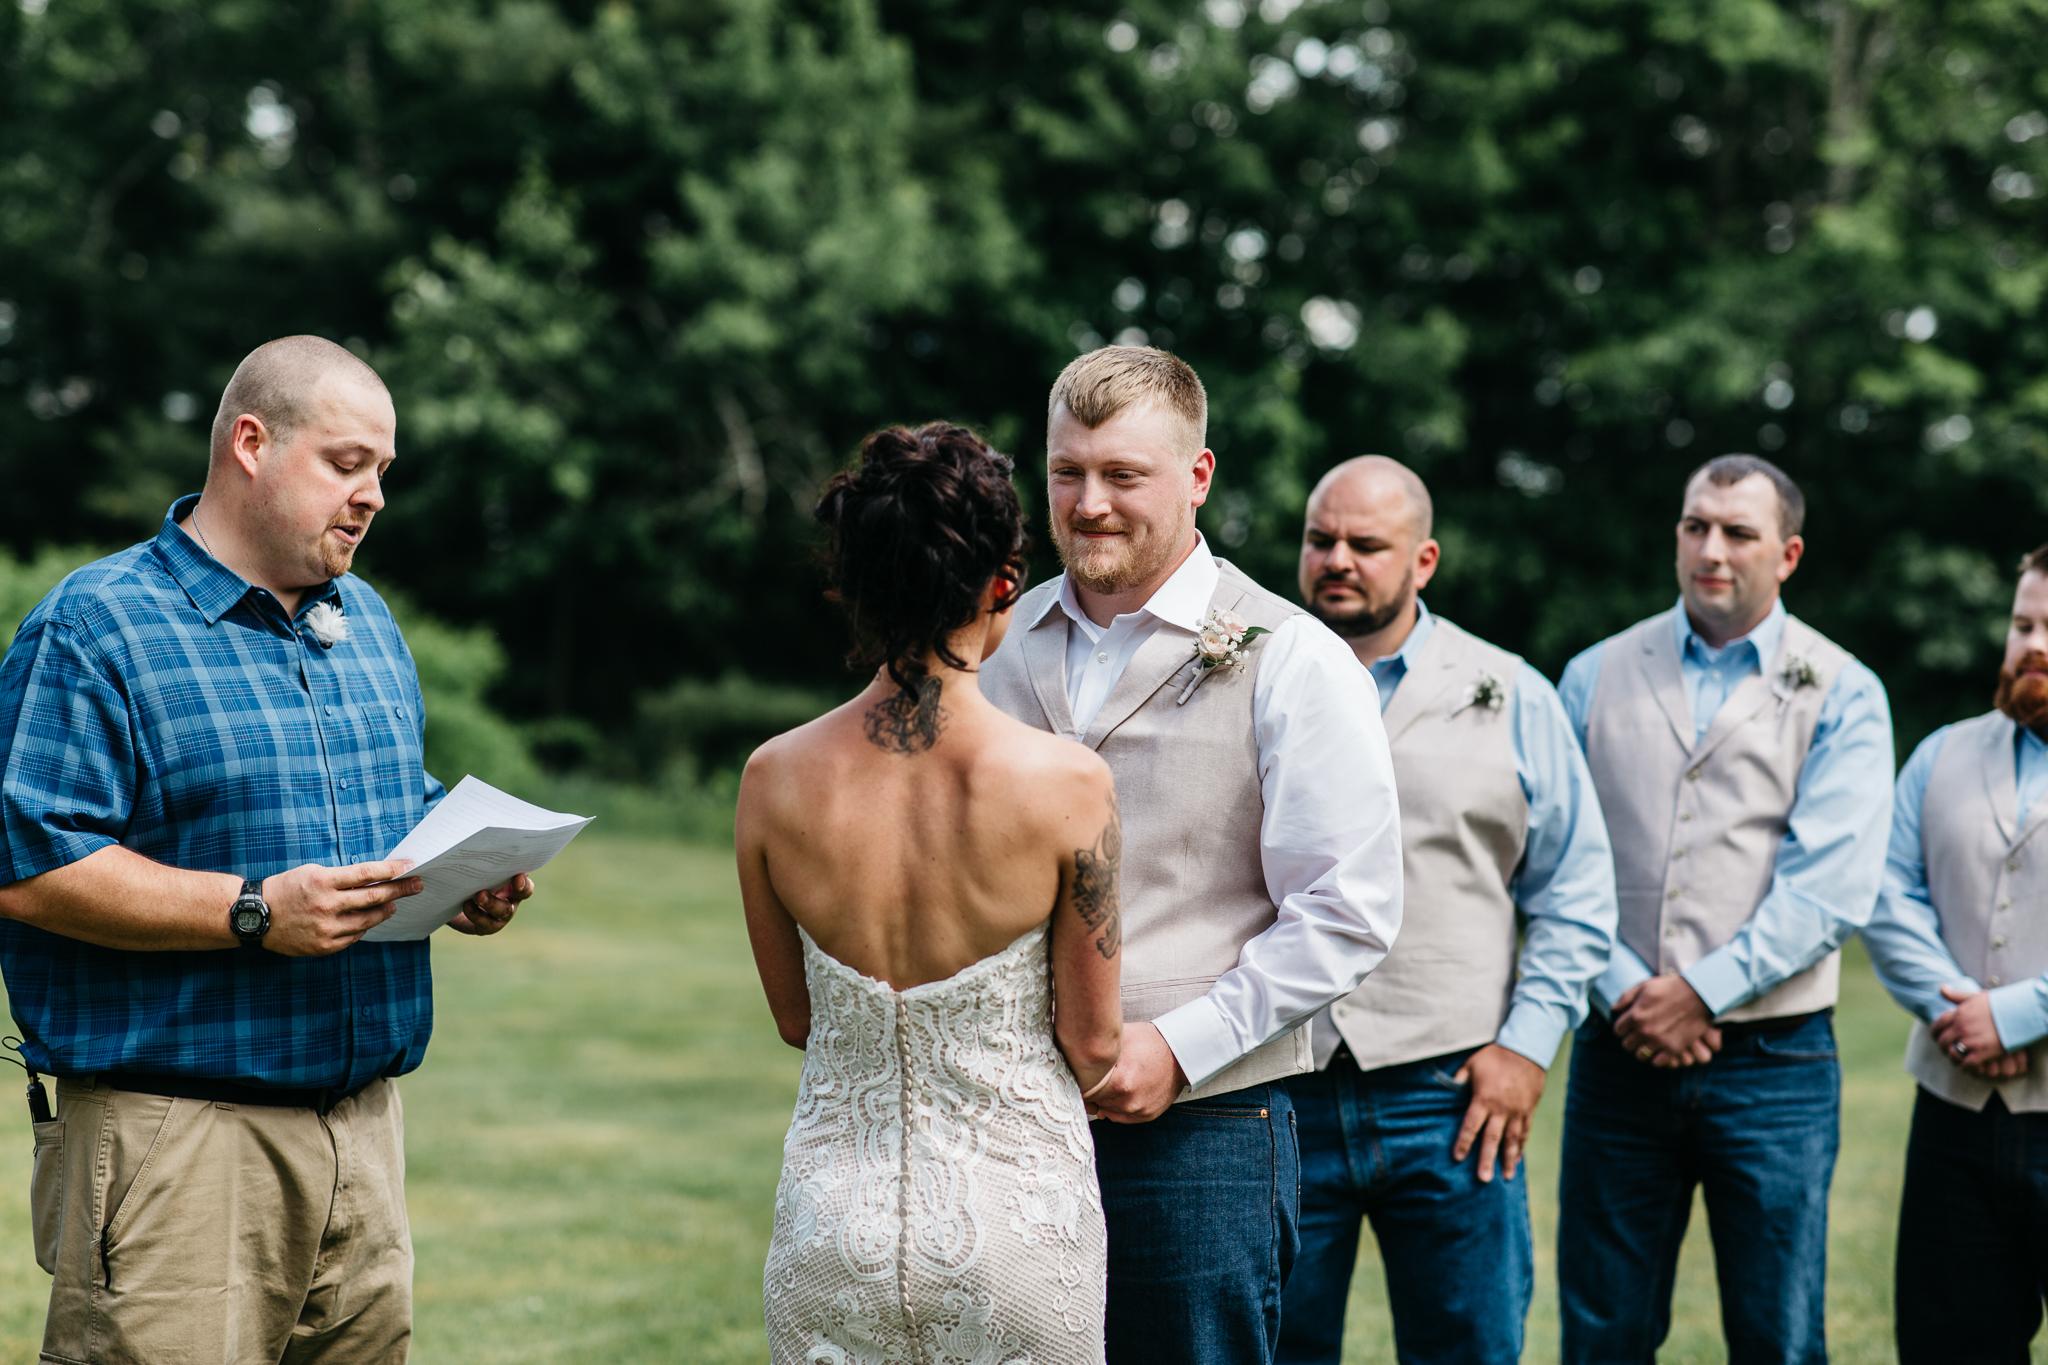 maine-wedding-photography-dayton-kennebunk-freeport-rustic-barn-ceremony-photographer.jpg